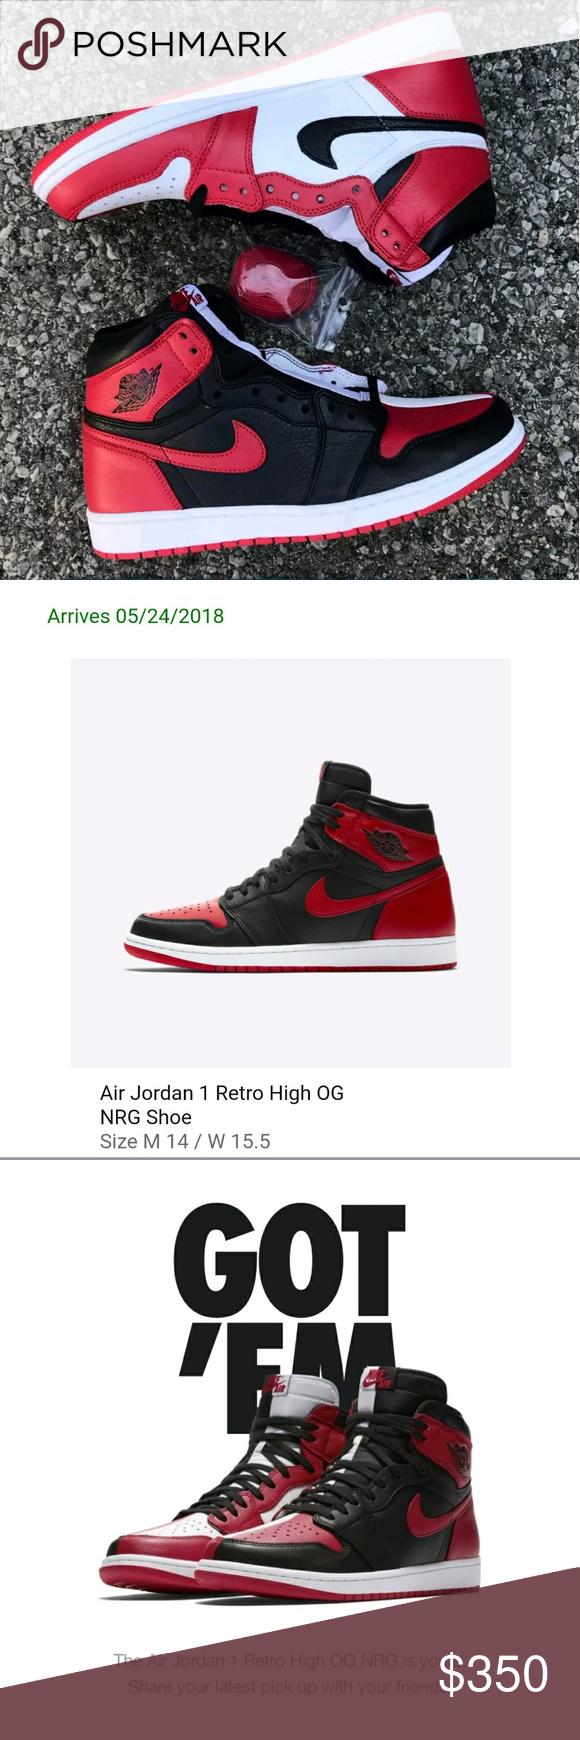 Nike Air Jordan Homage to Home Size 14 Order Confirmed